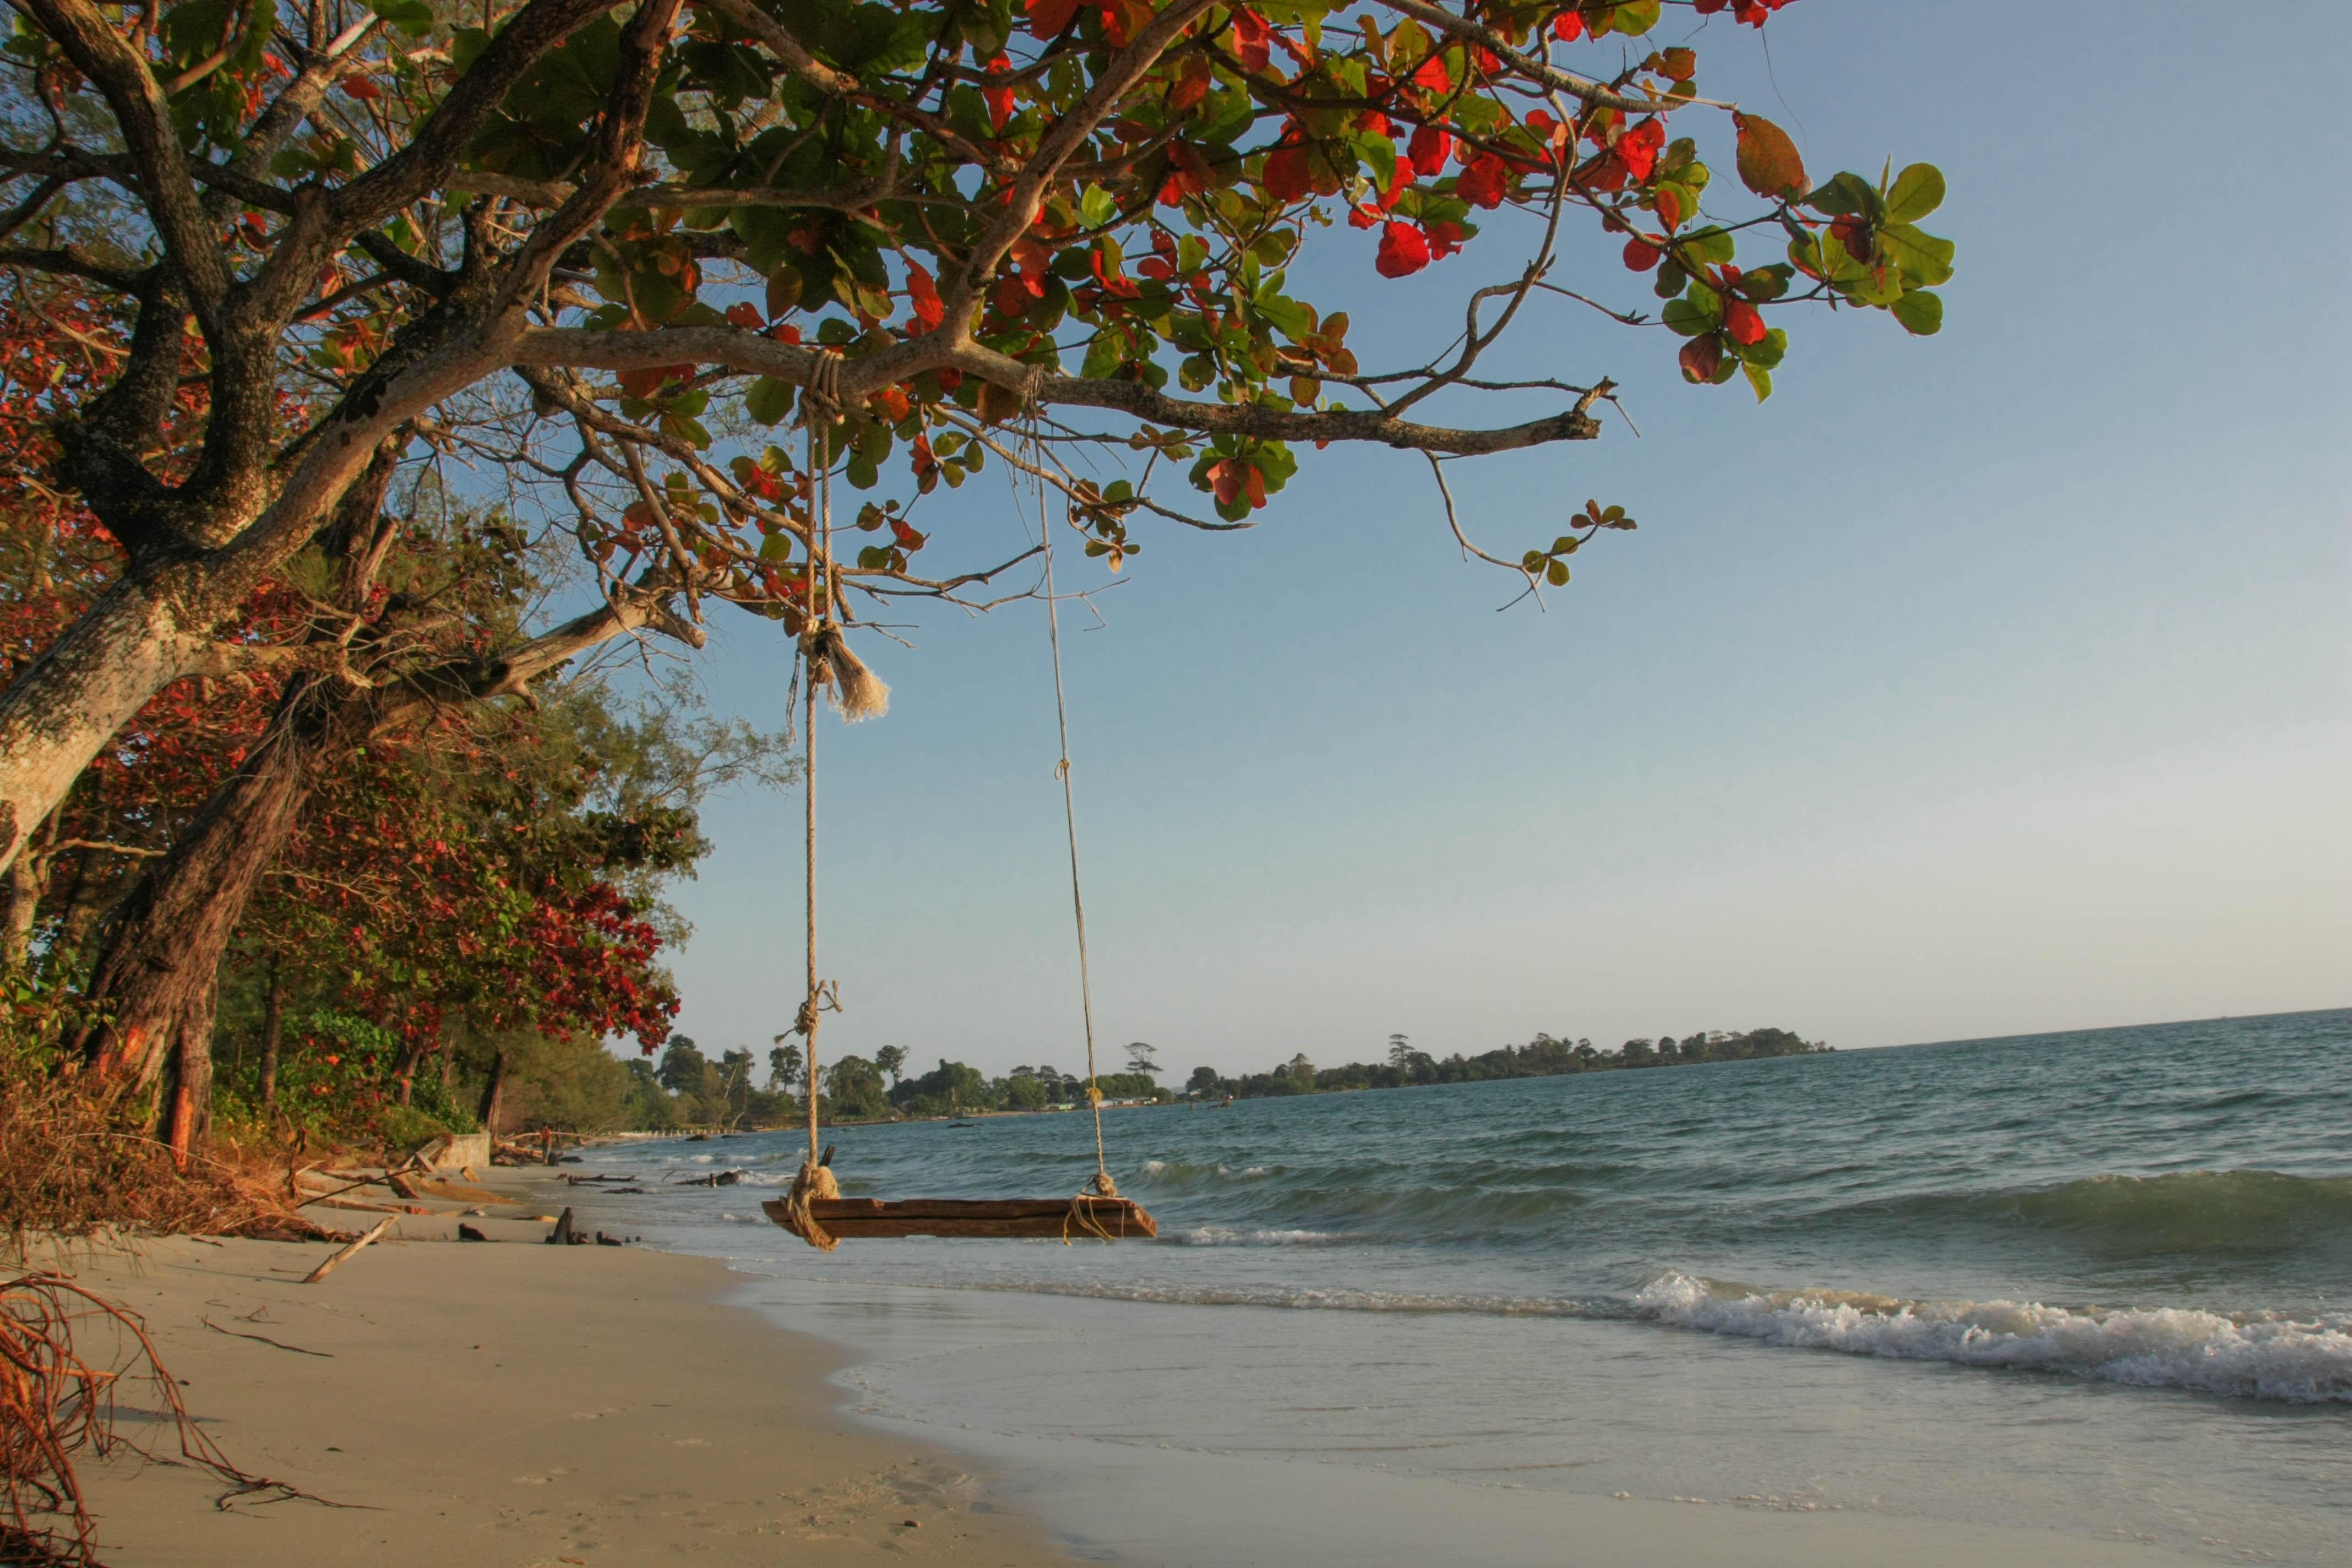 Independence beach Sihanoukville.